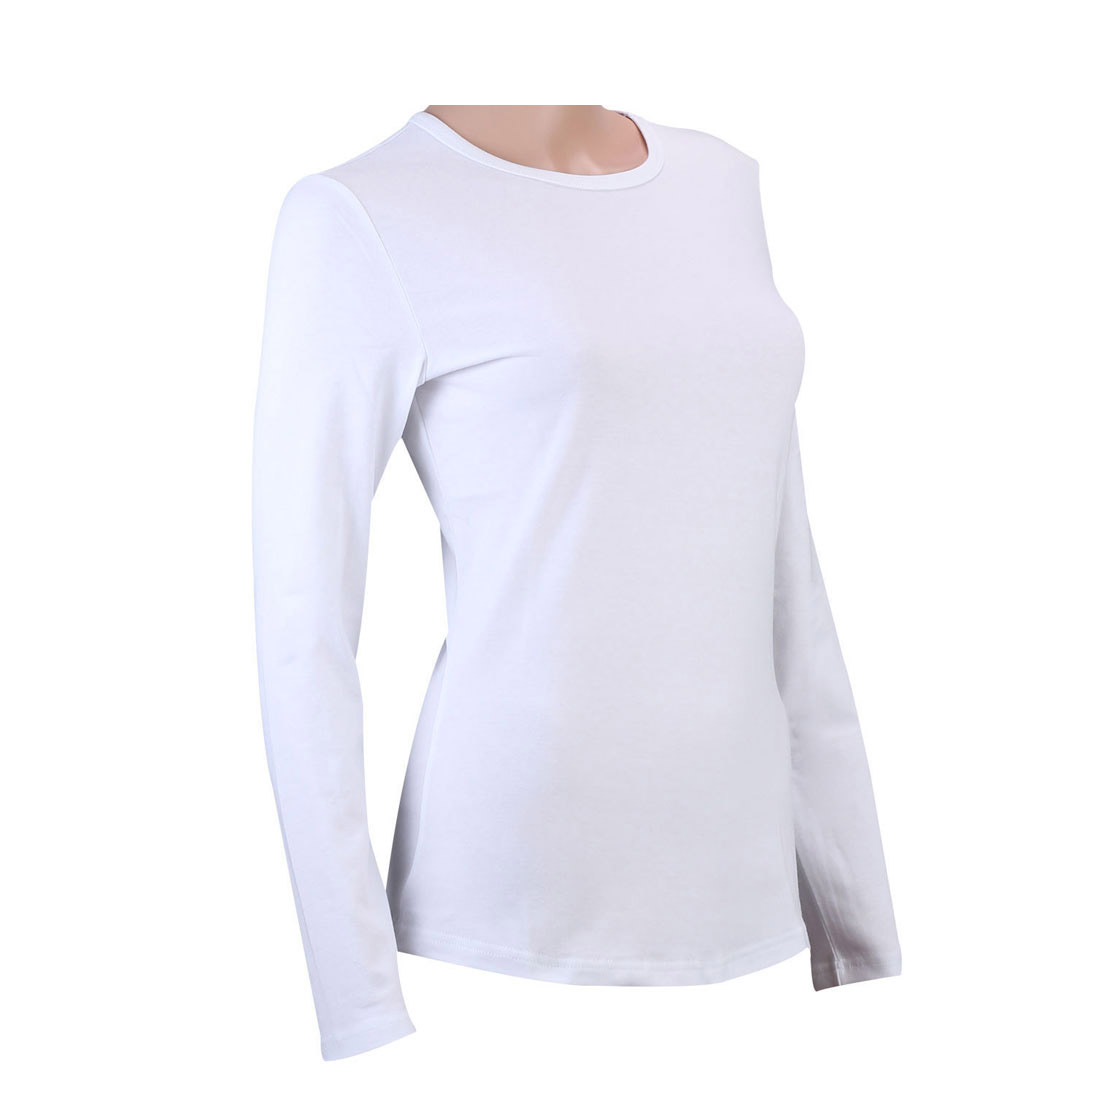 100 cotton womens v neck crew neck long sleeve t shirt for White long sleeve tee shirt womens